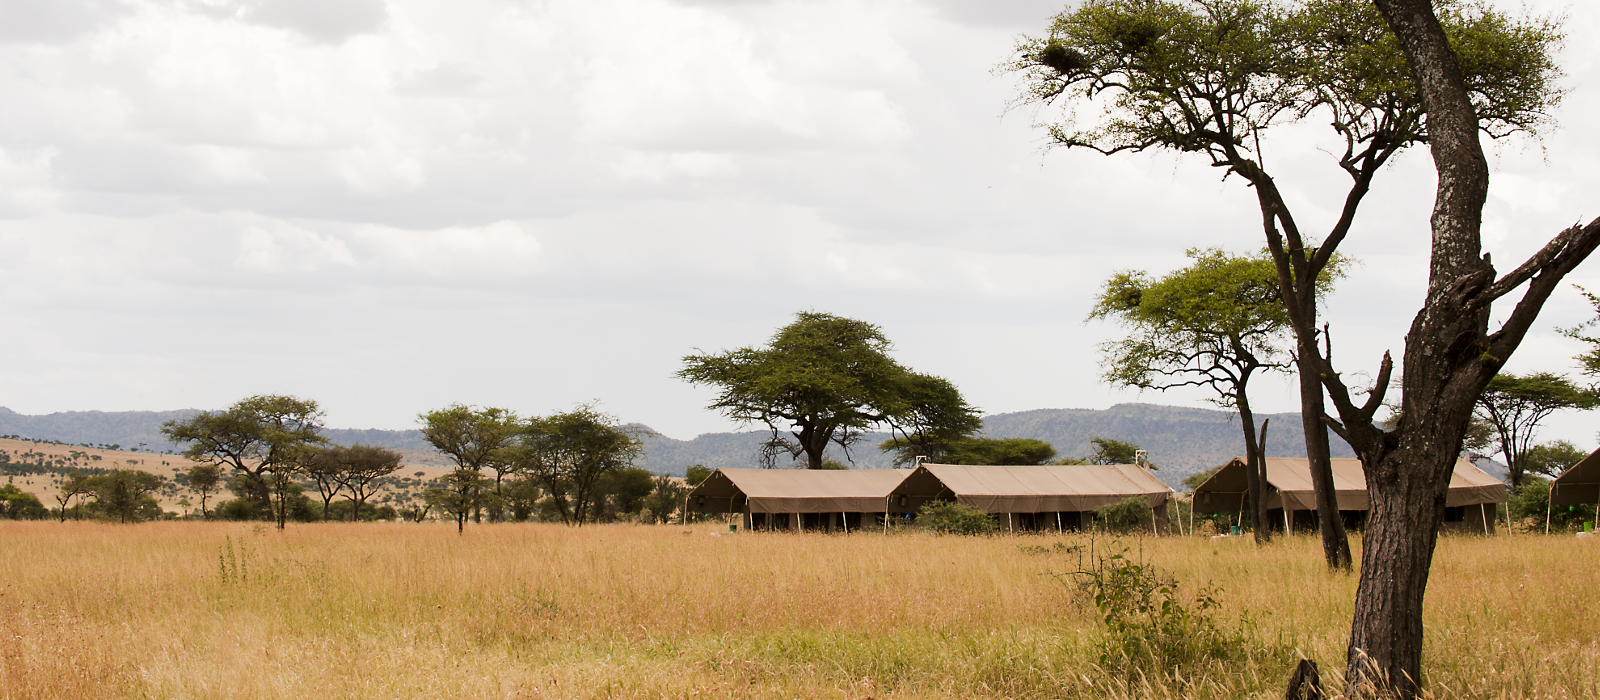 Hotel Serengeti Kati Kati Tented Camp Tansania